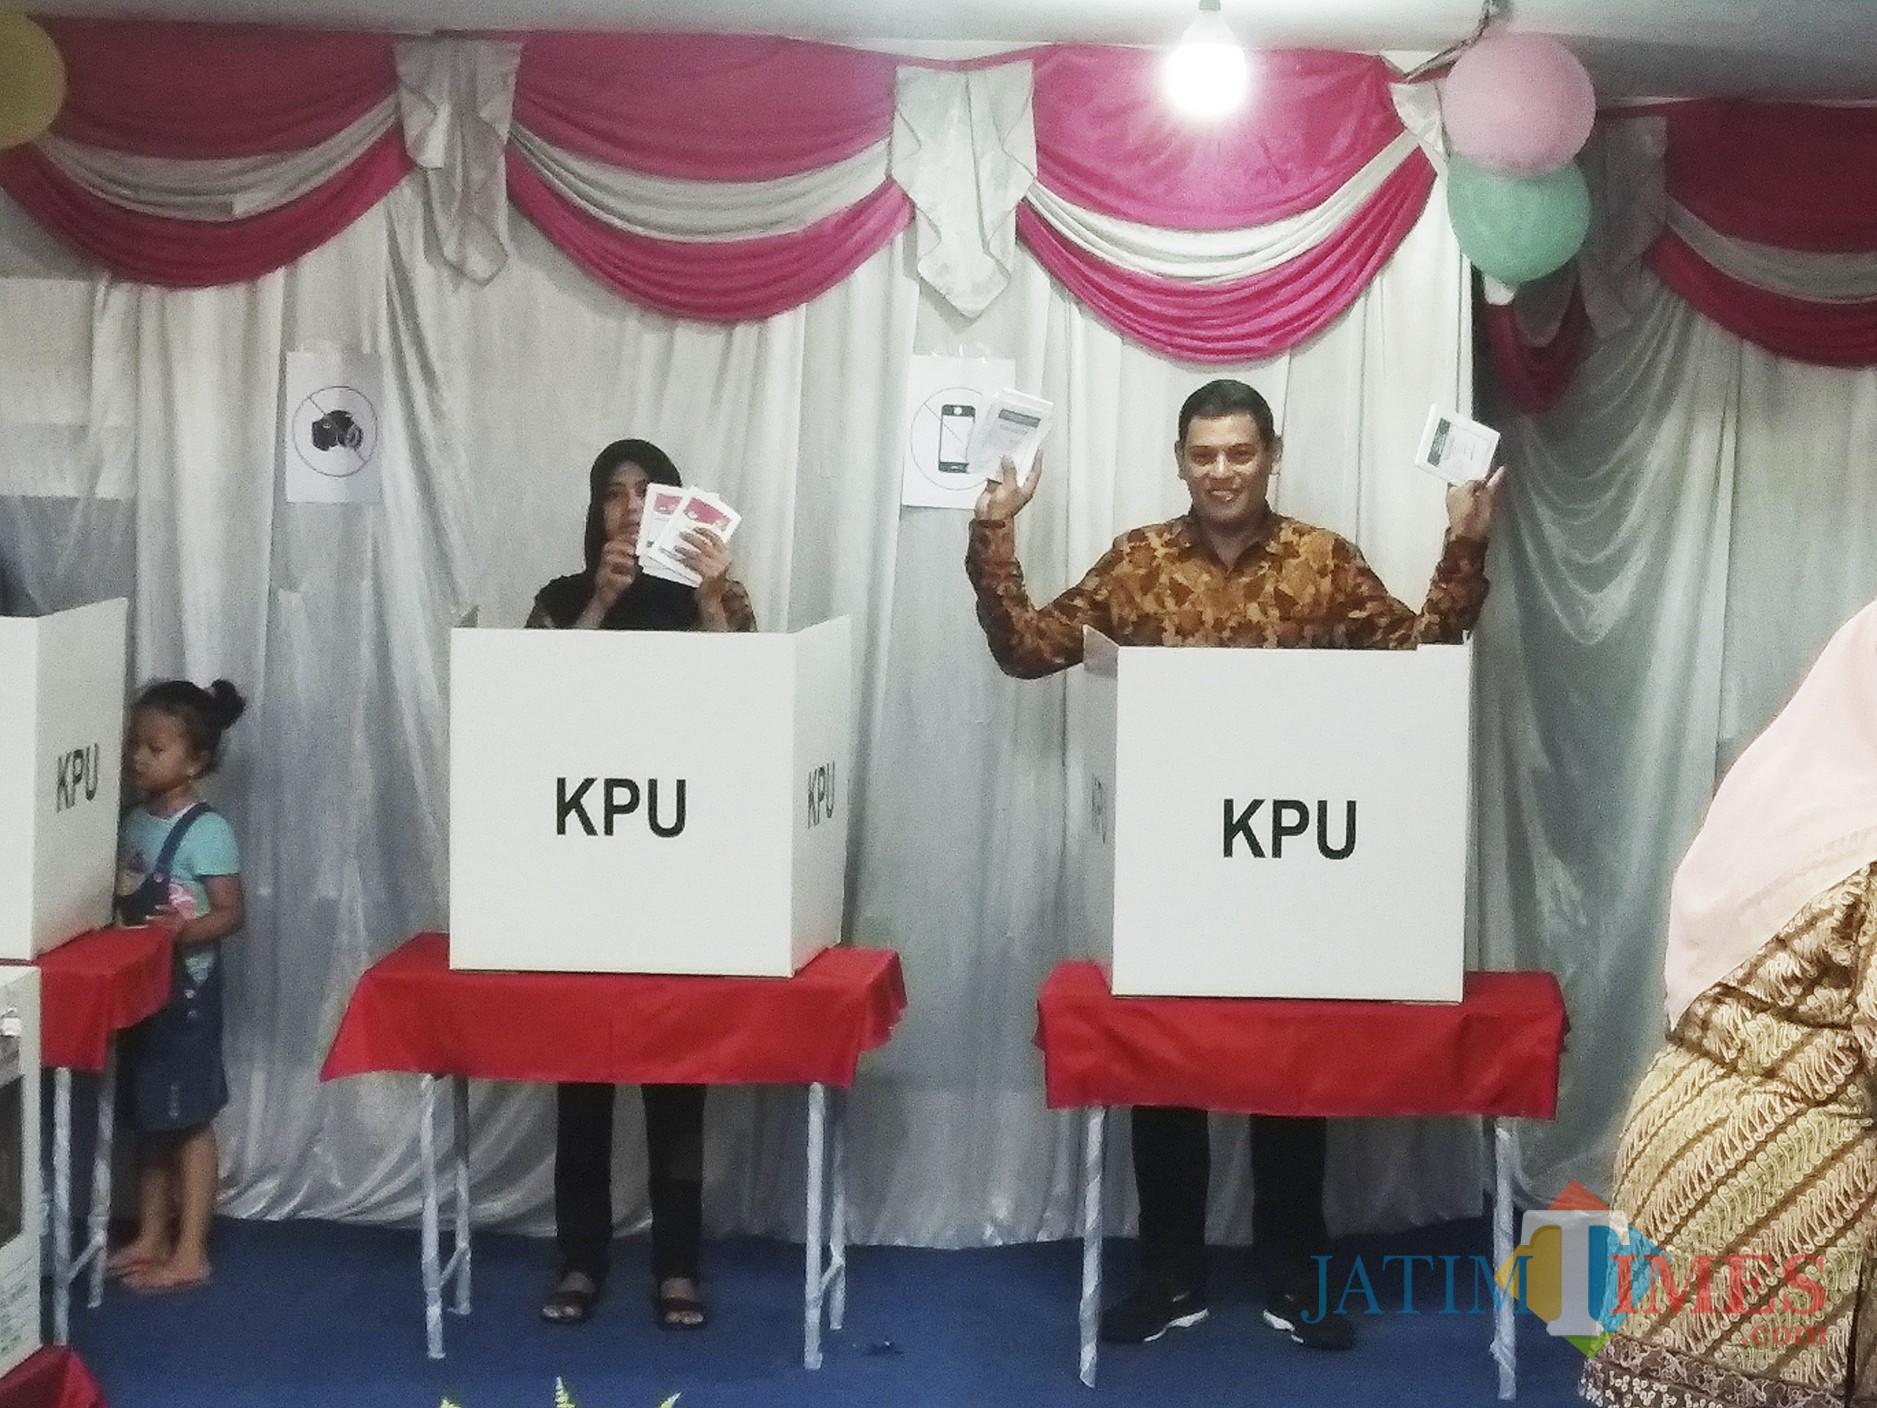 Wali Kota Kediri terpilih Abdullah Abu Bakar bersama istrinya saat mencoblos di TPS Kelurahan Banjaran Kota Kediri. (Eko Arif S /JatimTIMES)